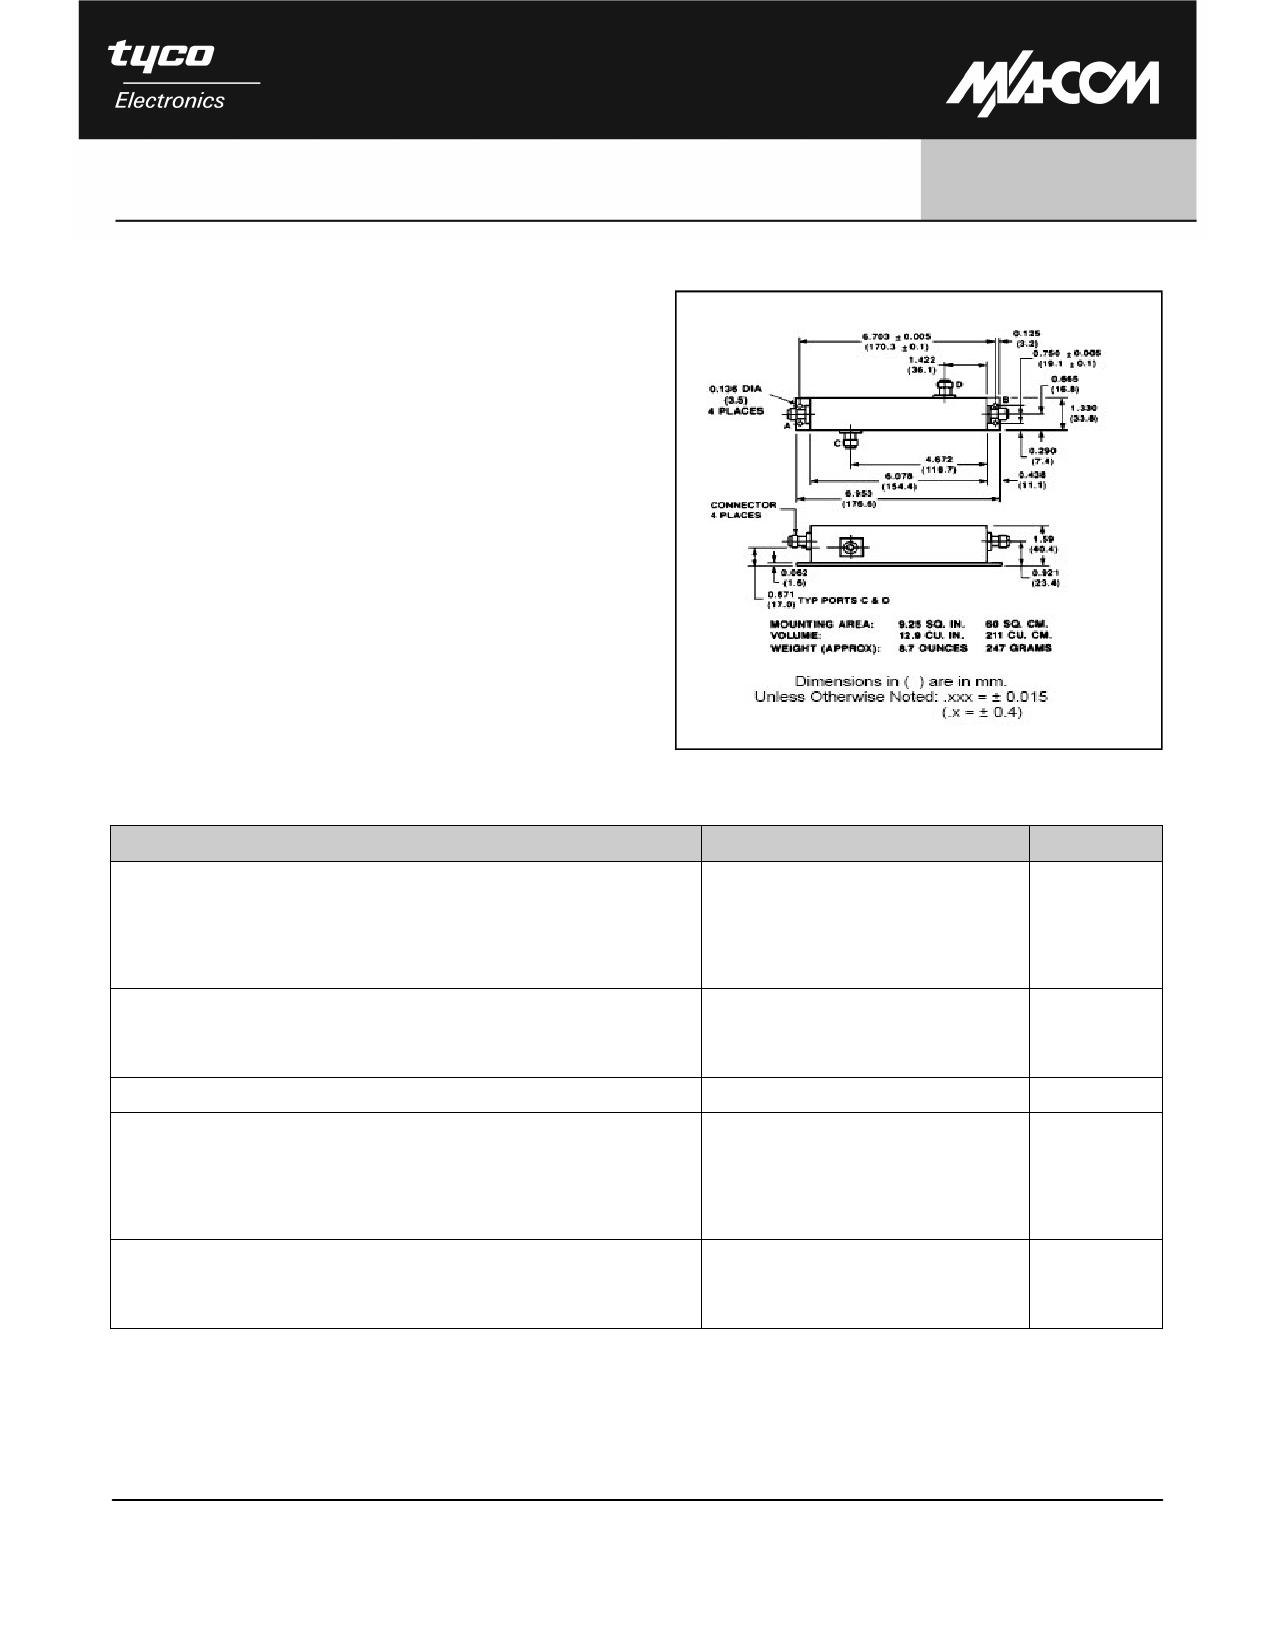 H-9 datasheet